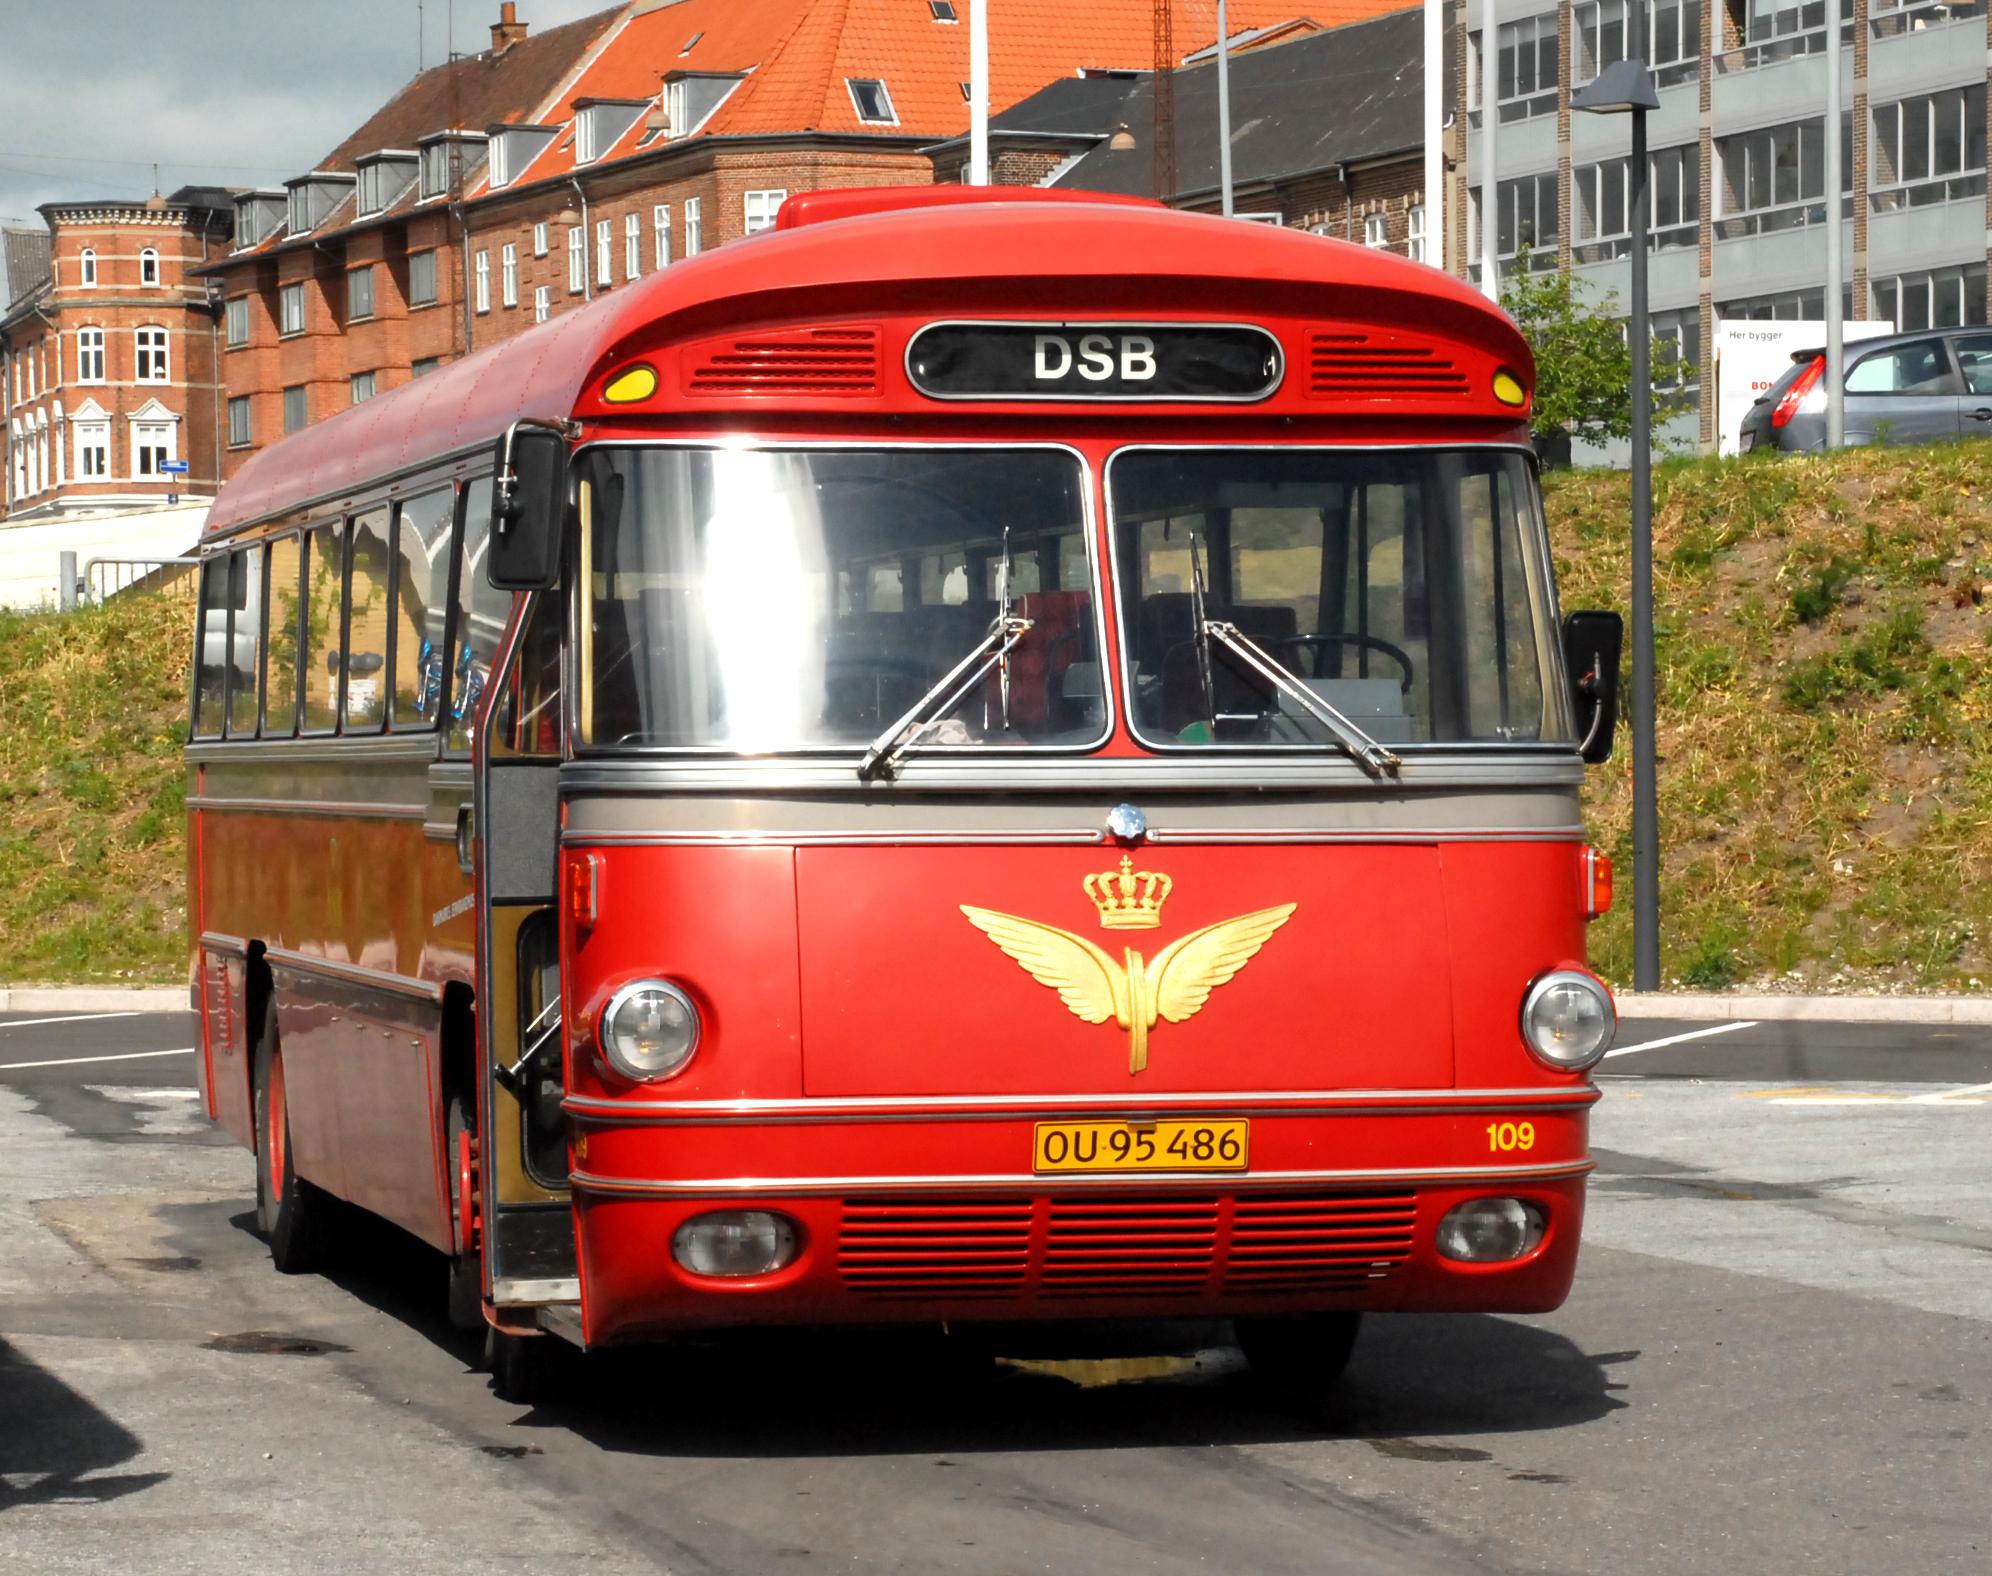 dsb bus